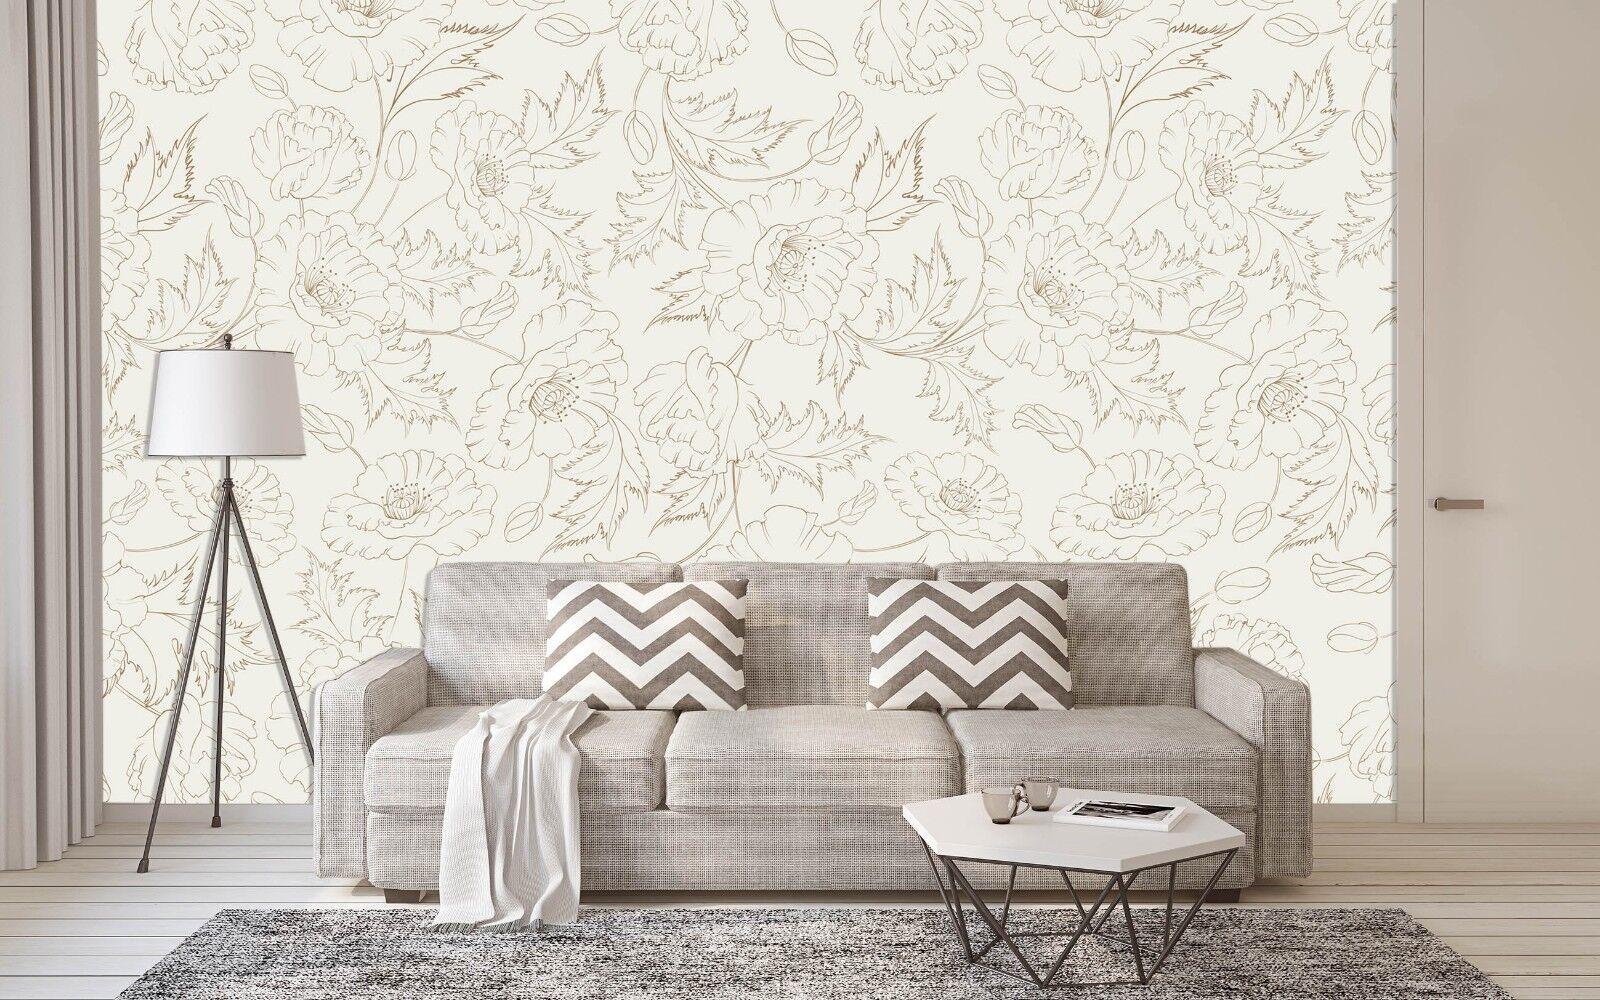 3D Hand Painted Flowers 4 Wallpaper Murals Wall Print Wallpaper Mural AJ WALL AU